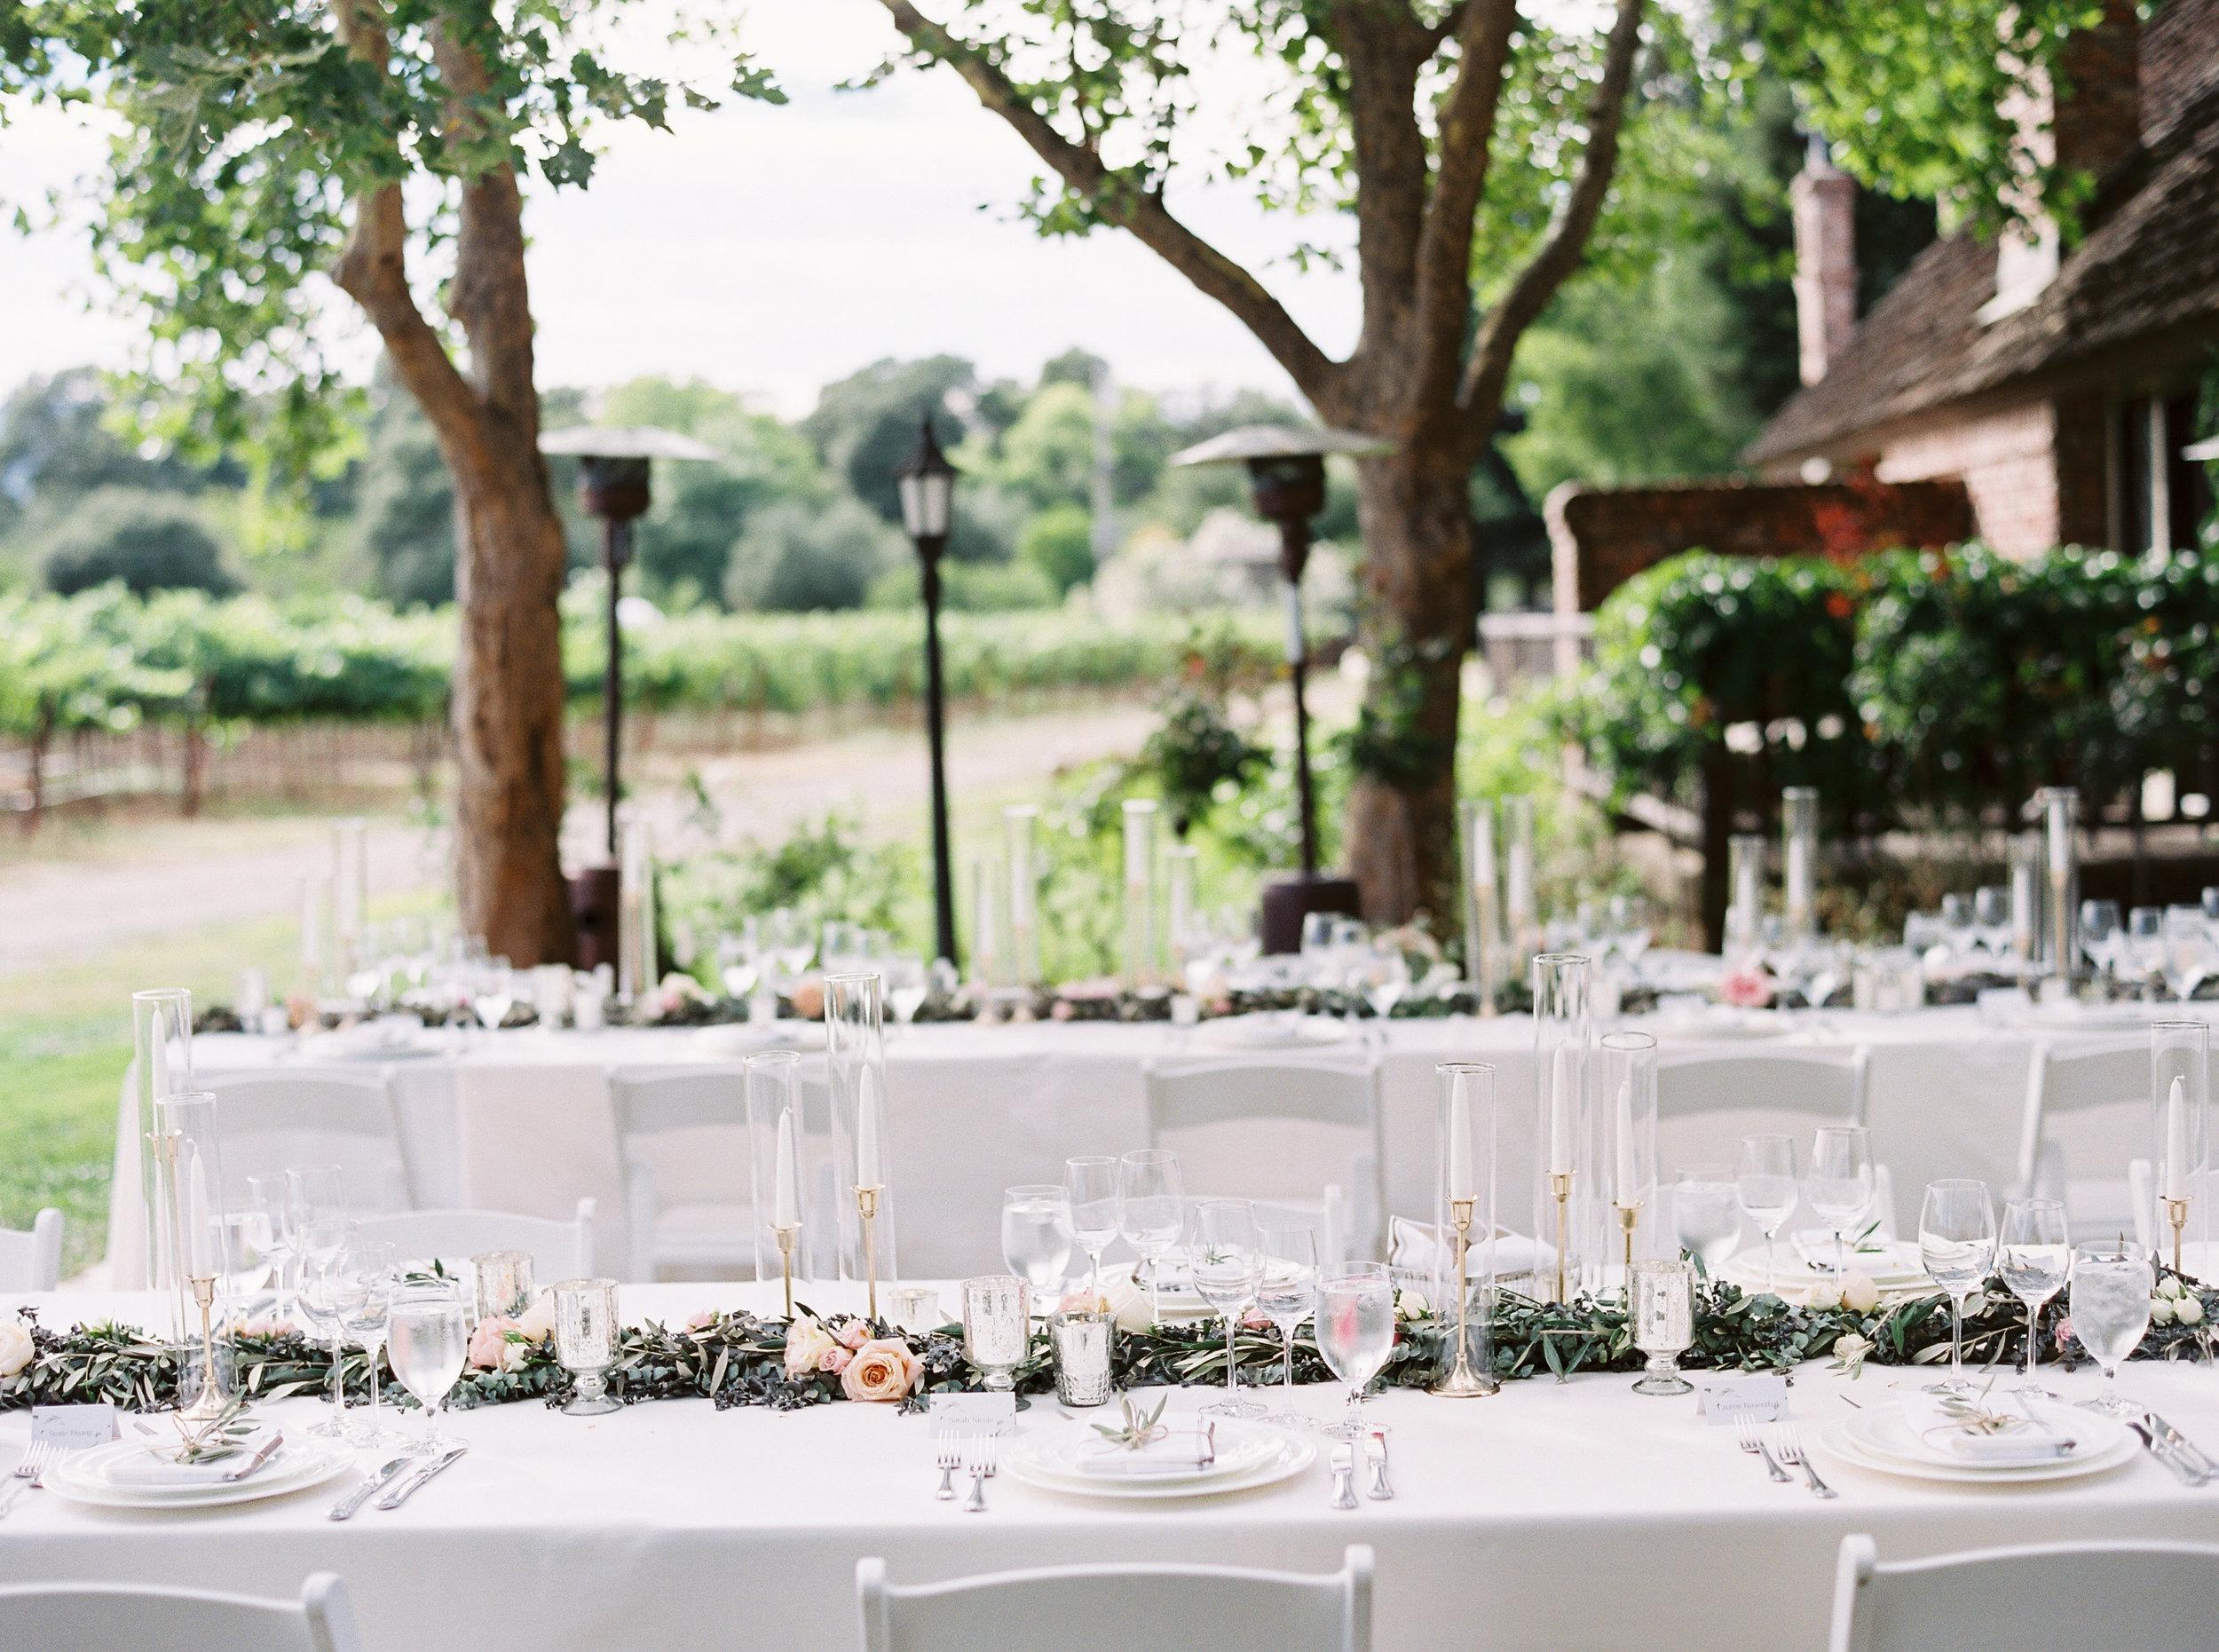 Harvest-inn-wedding-in-napa-california-181.jpg